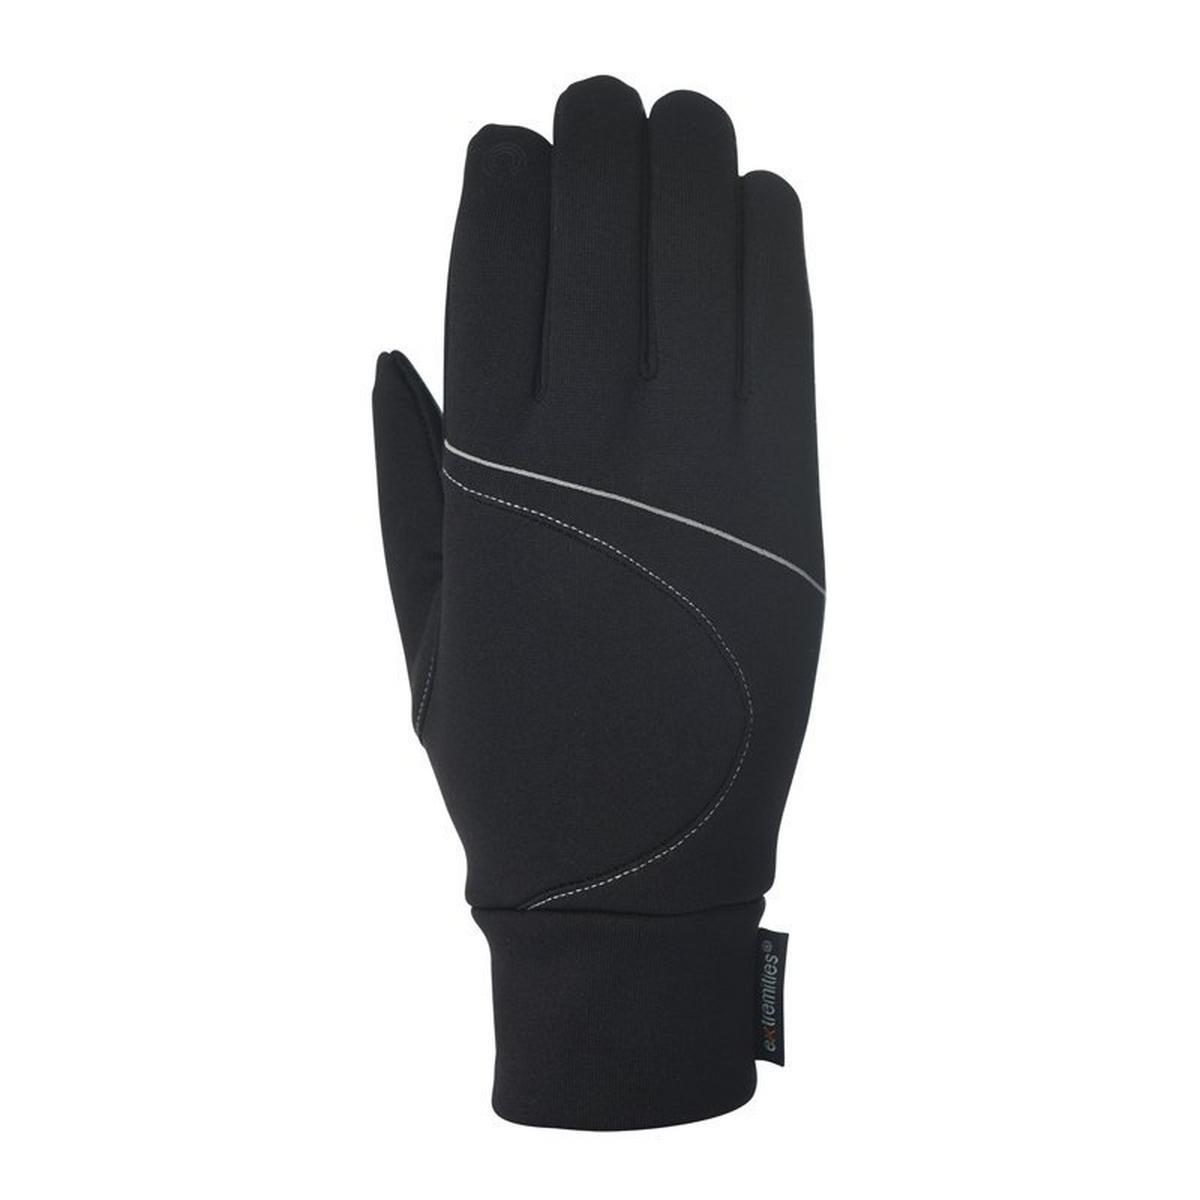 Extremities Unisex Power Liner Glove